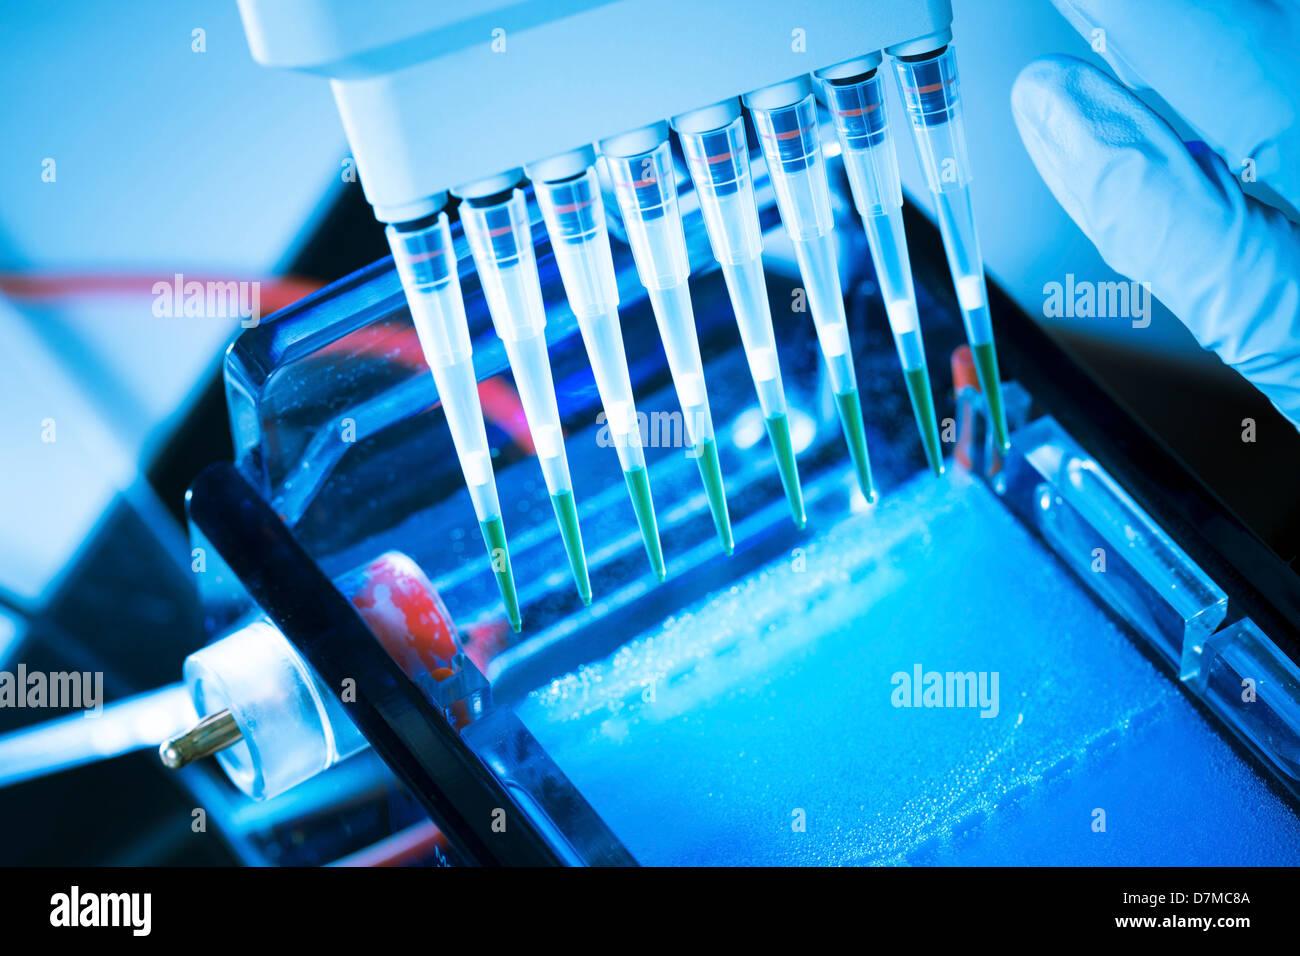 Gel electrophoresis - Stock Image